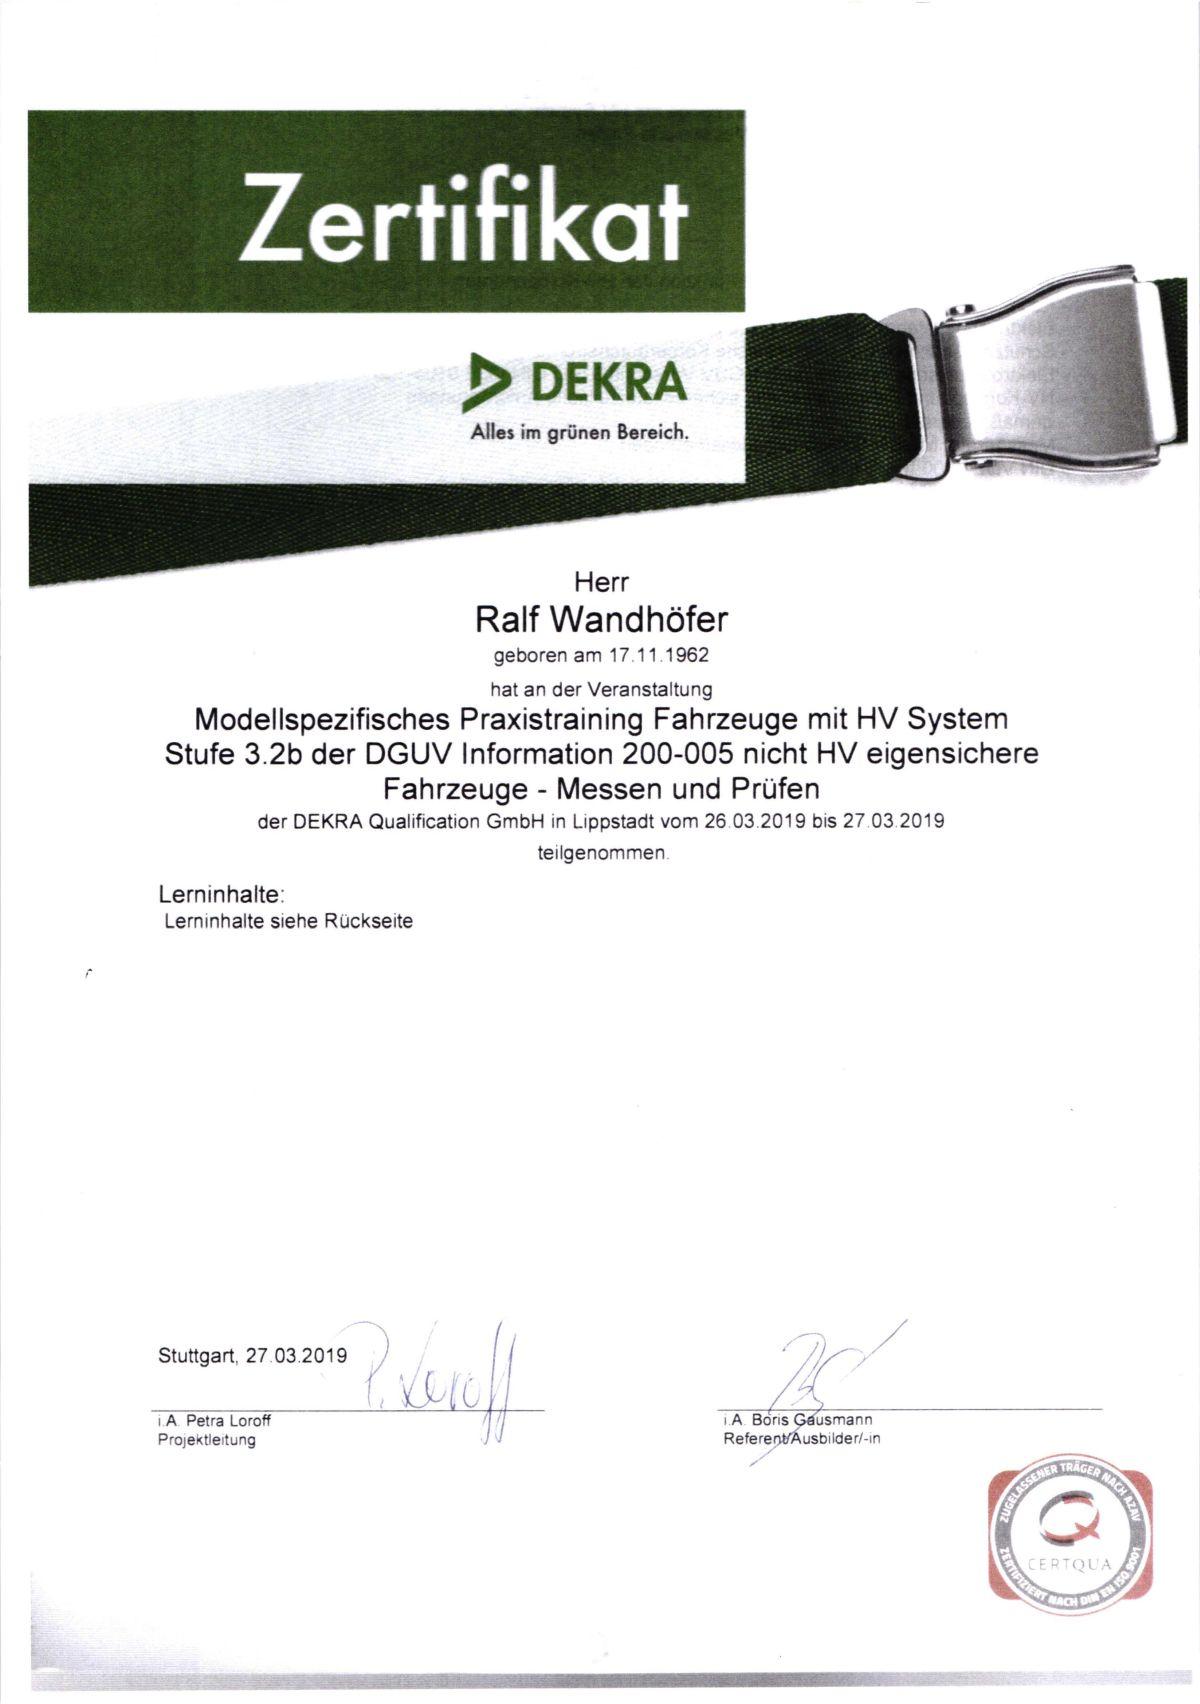 Ralf_Wandhöfer_Zertifikat_012